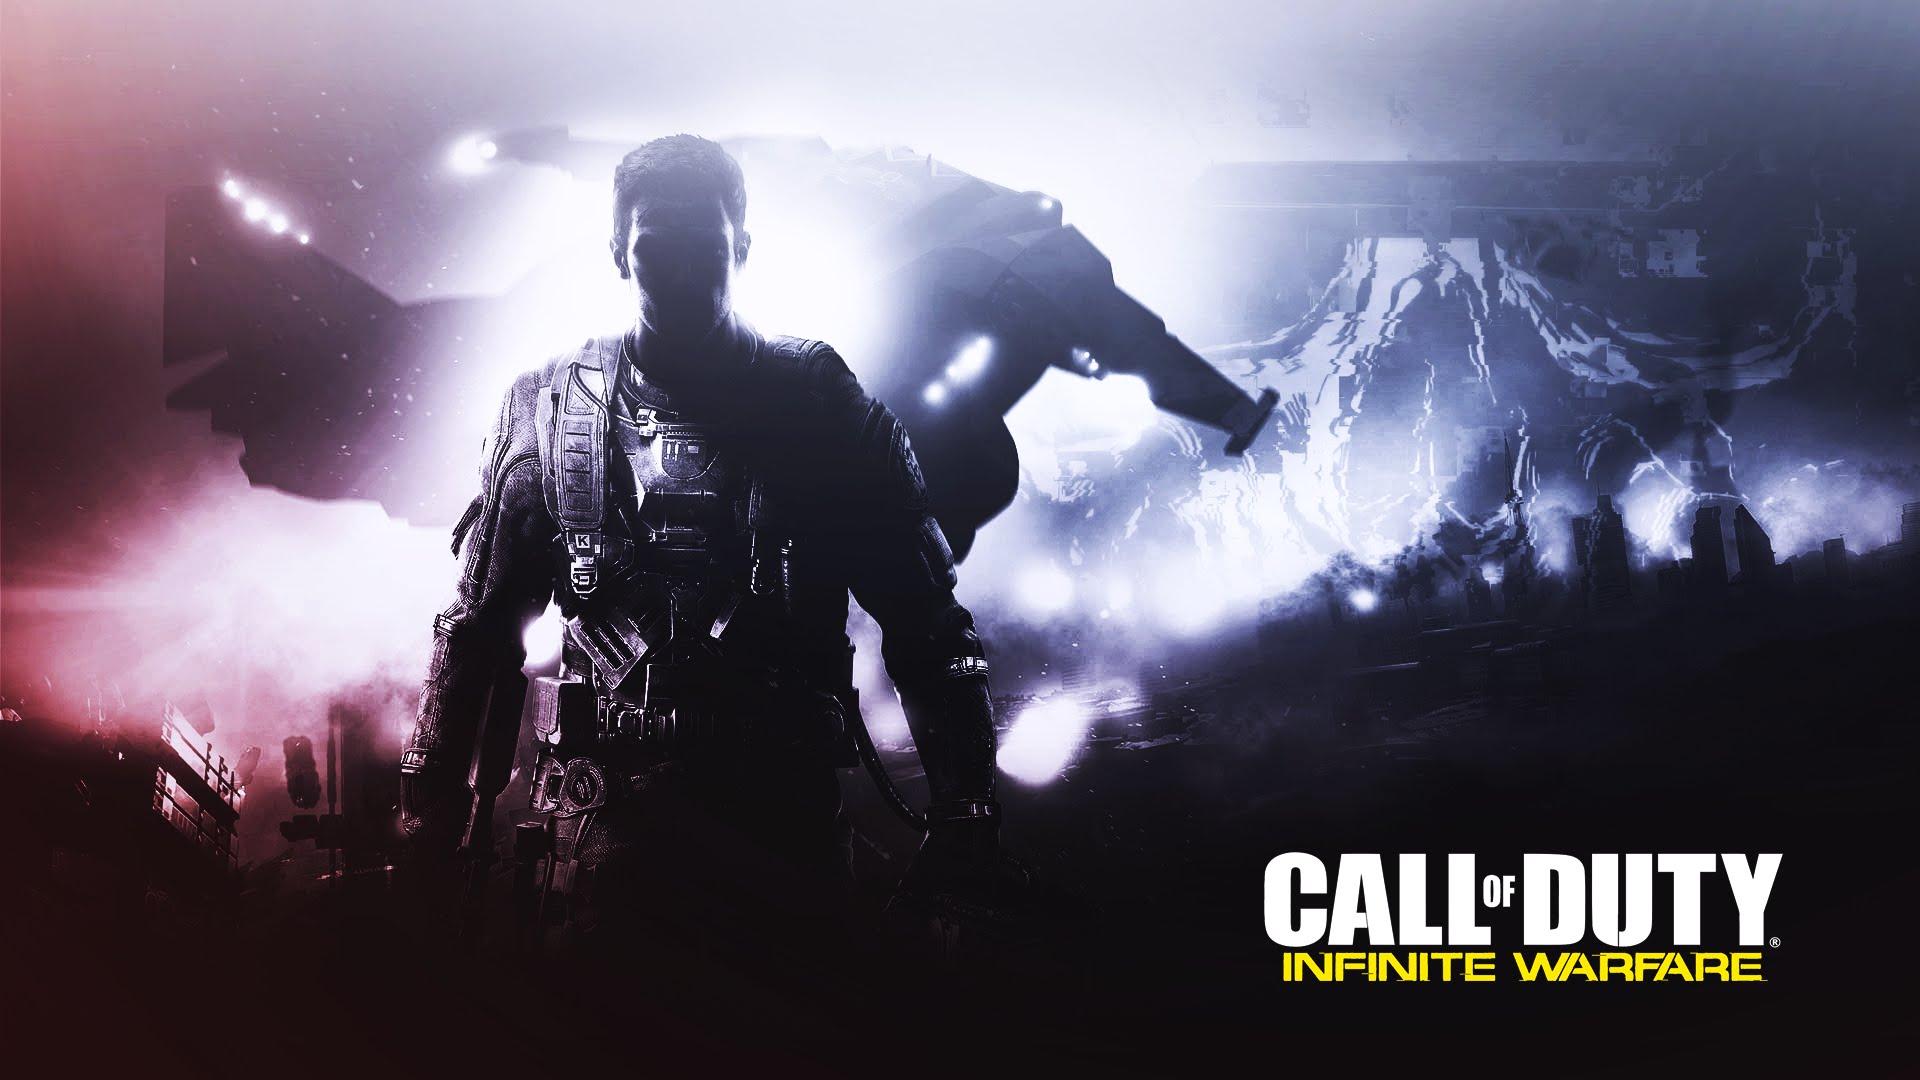 FREE* Call of Duty: Infinite Warfare Wallpaper (Download Link in